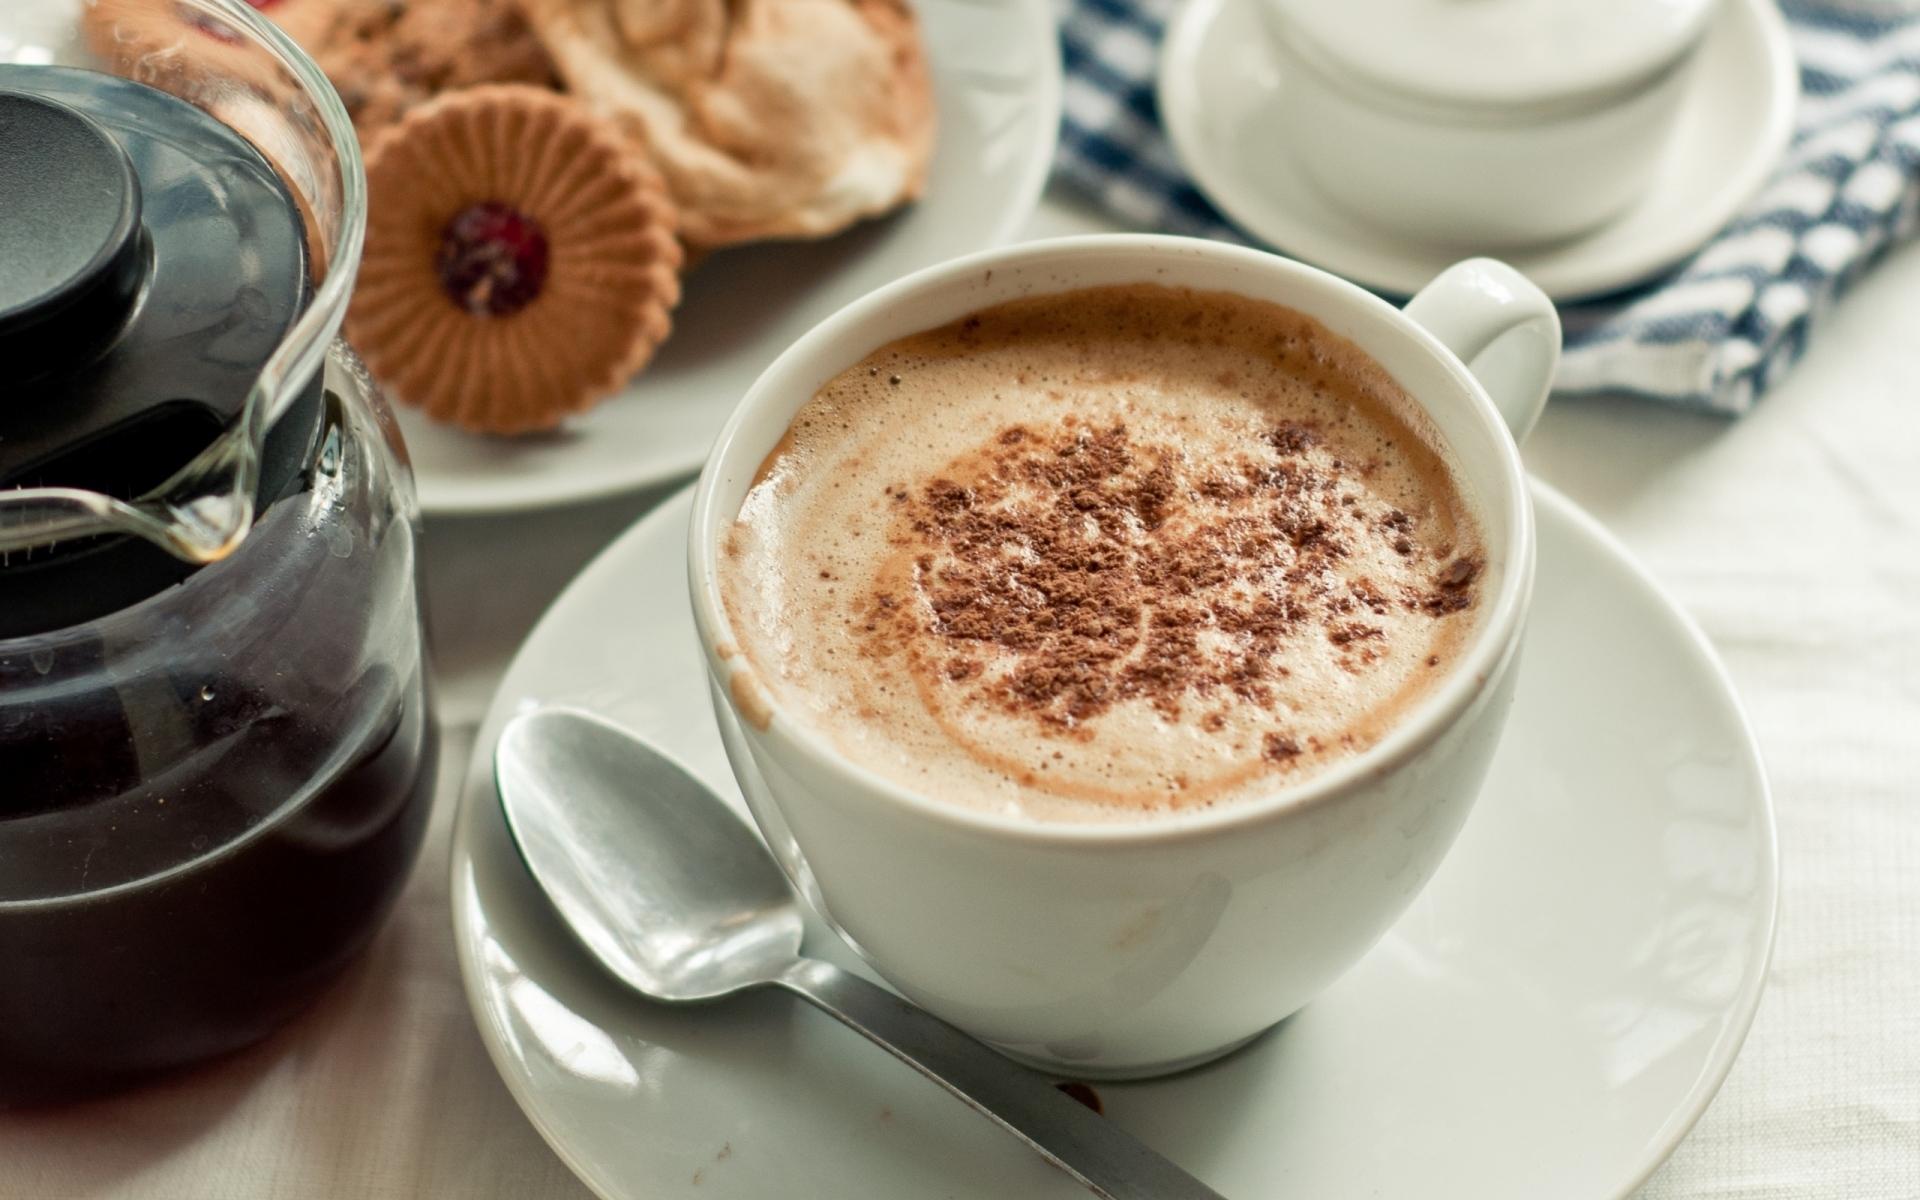 Картинки Чашка, кофе, кожа, корица, печенье, утро фото и обои на рабочий стол